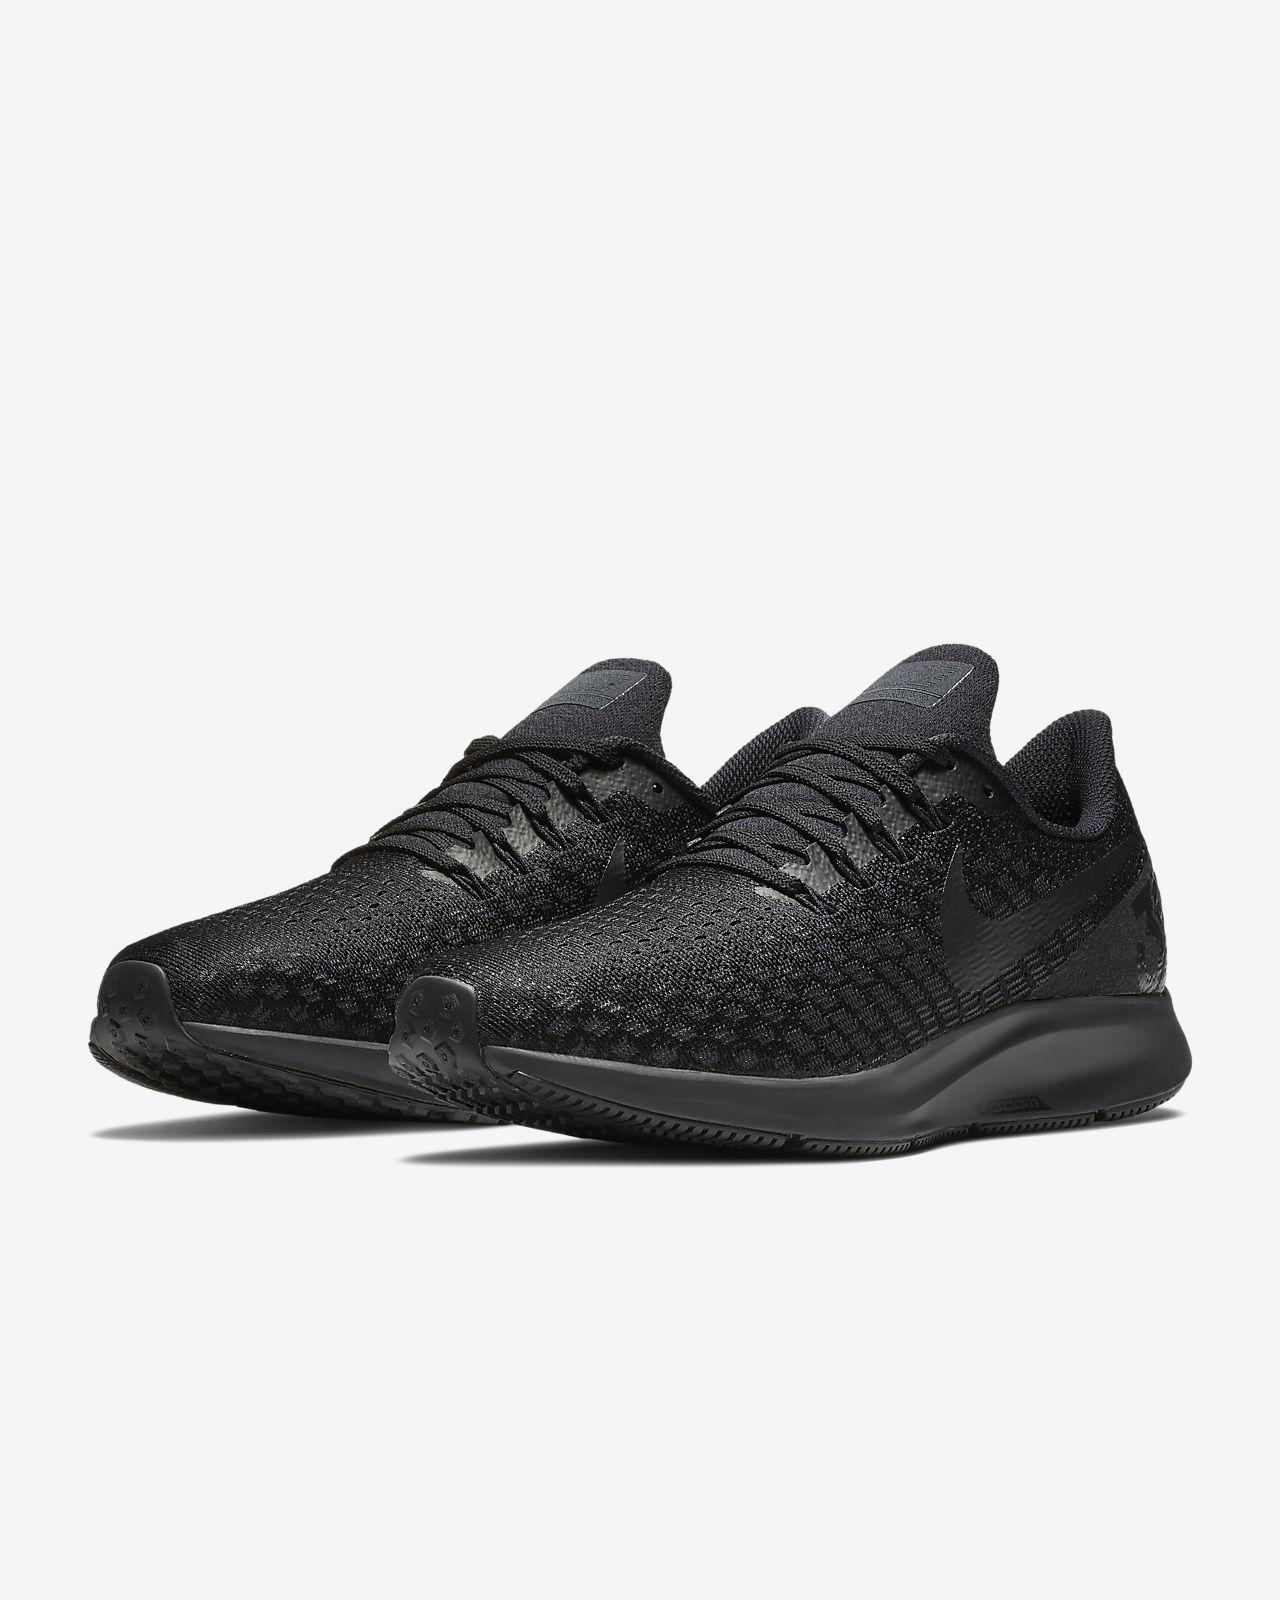 online store 51663 f0710 ... Calzado de running para hombre Nike Air Zoom Pegasus 35